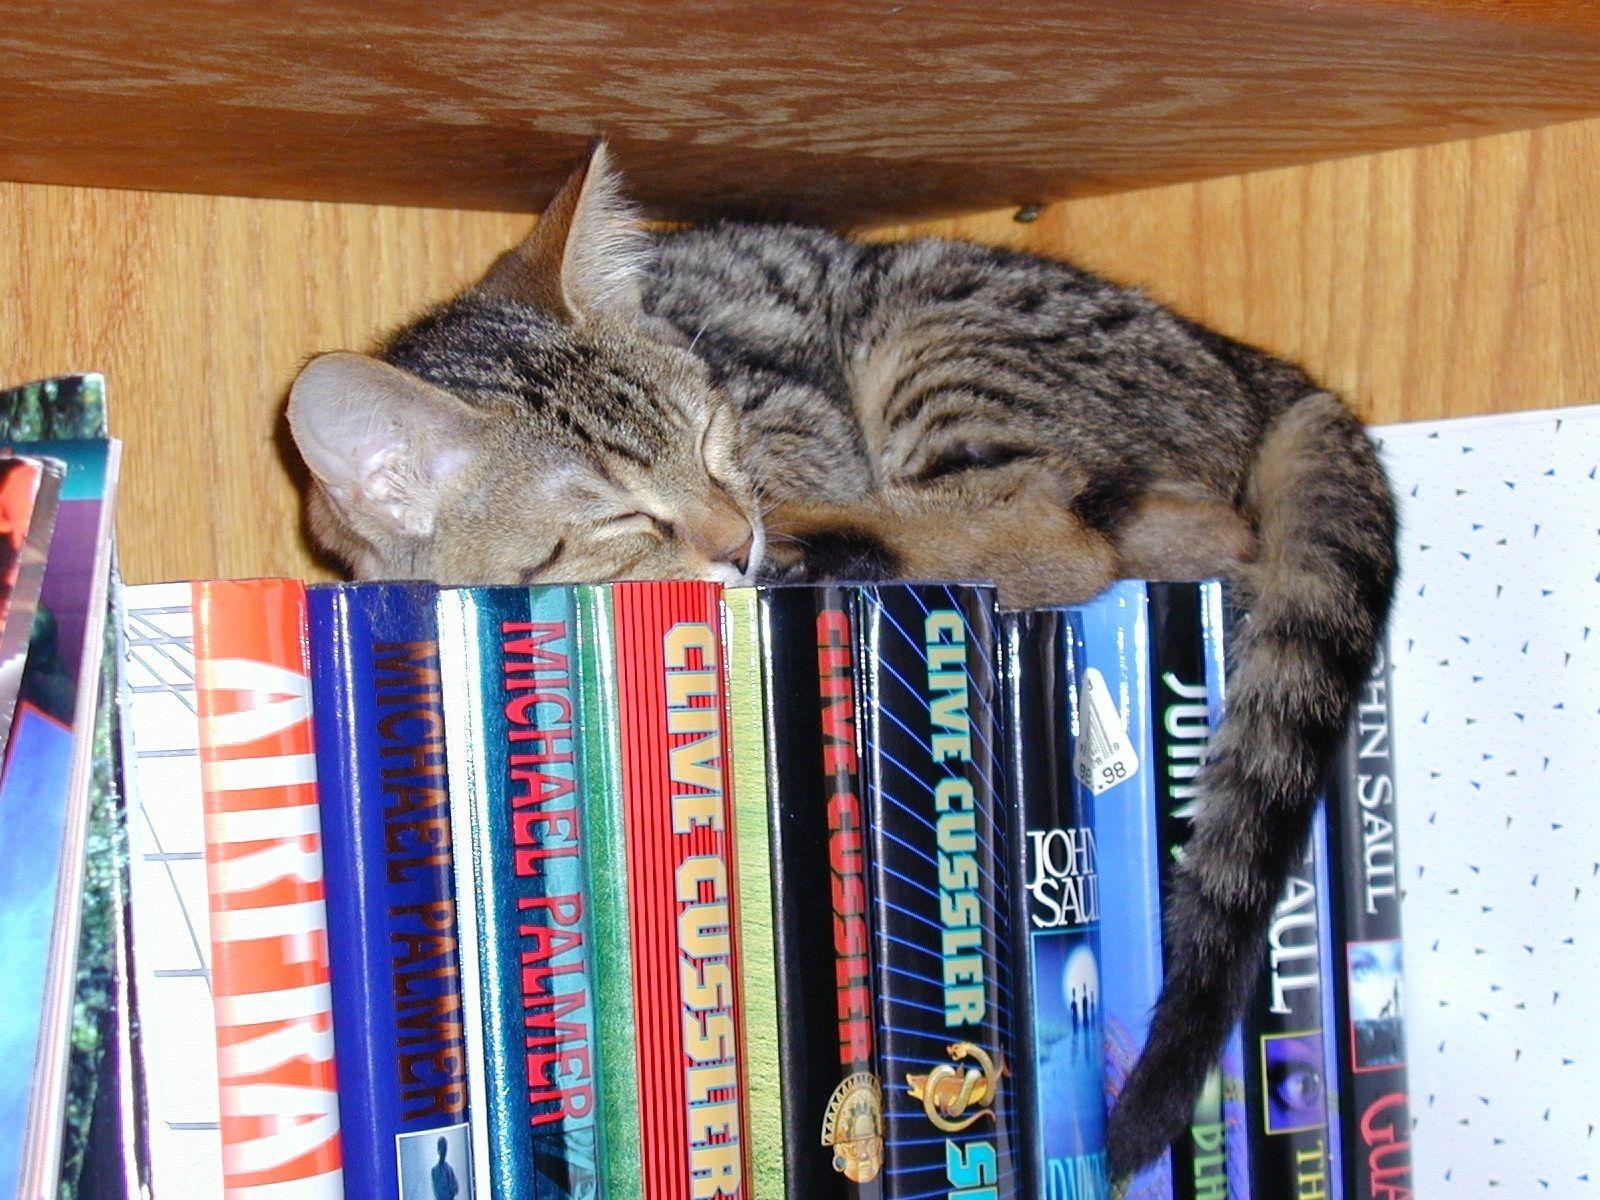 Books To Read Wallpaper Books Wallpaper Cat Books Cats Sleeping Kitten